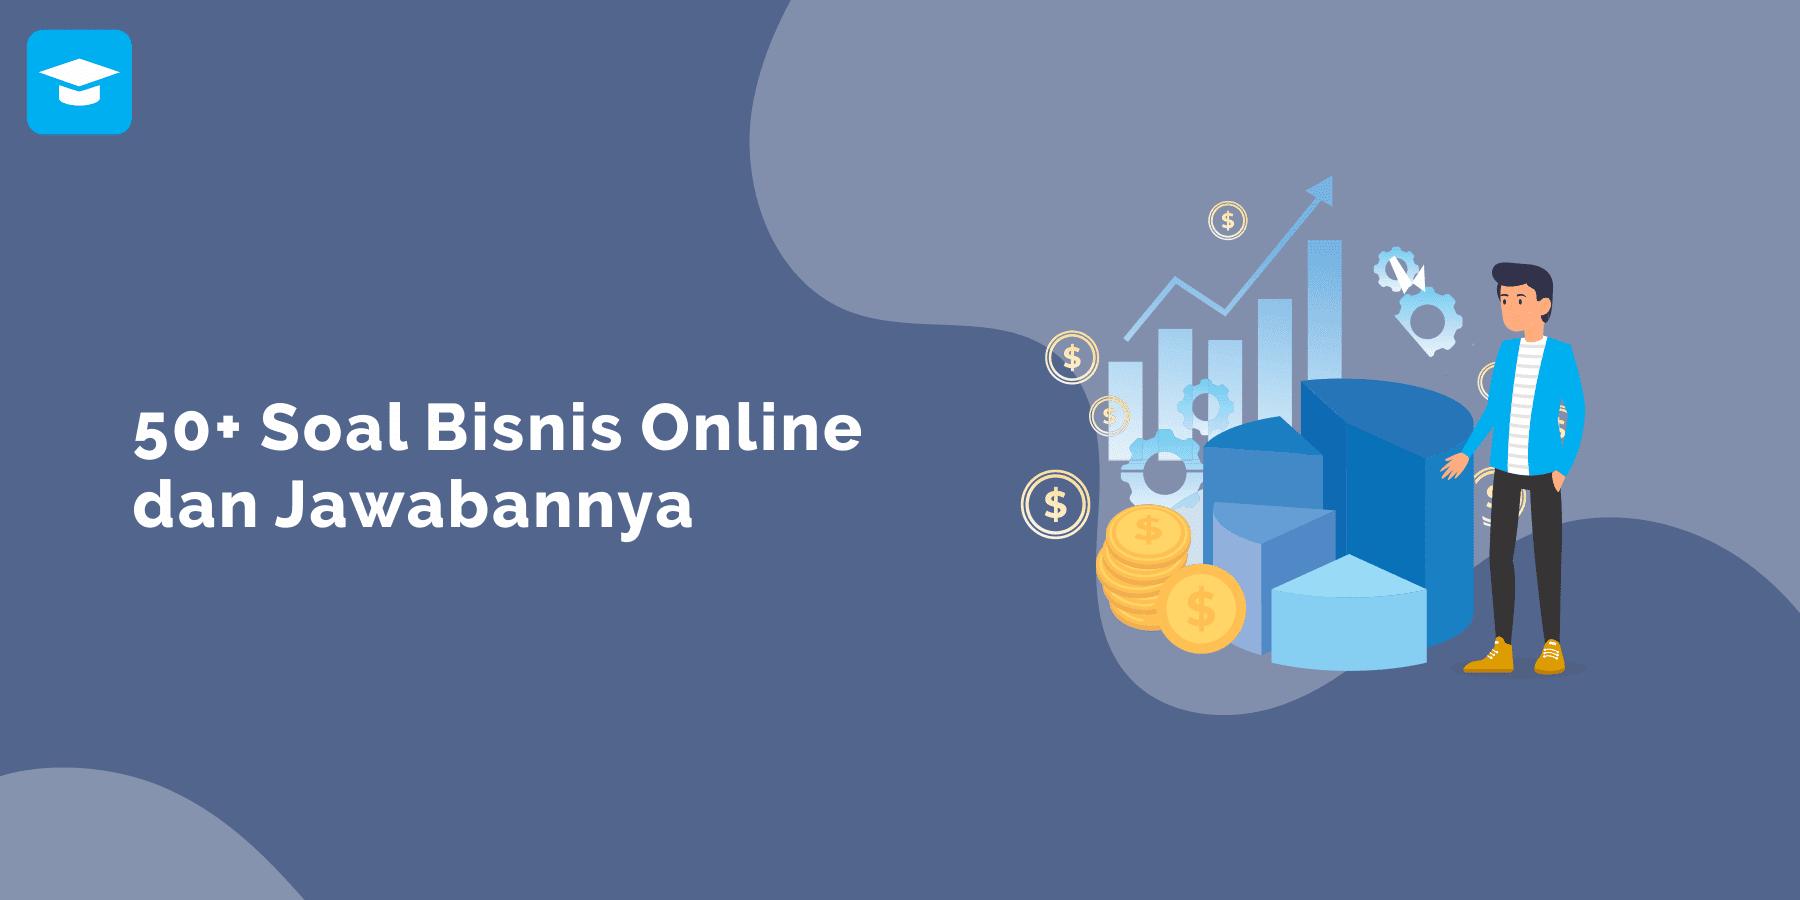 Soal bisnis online